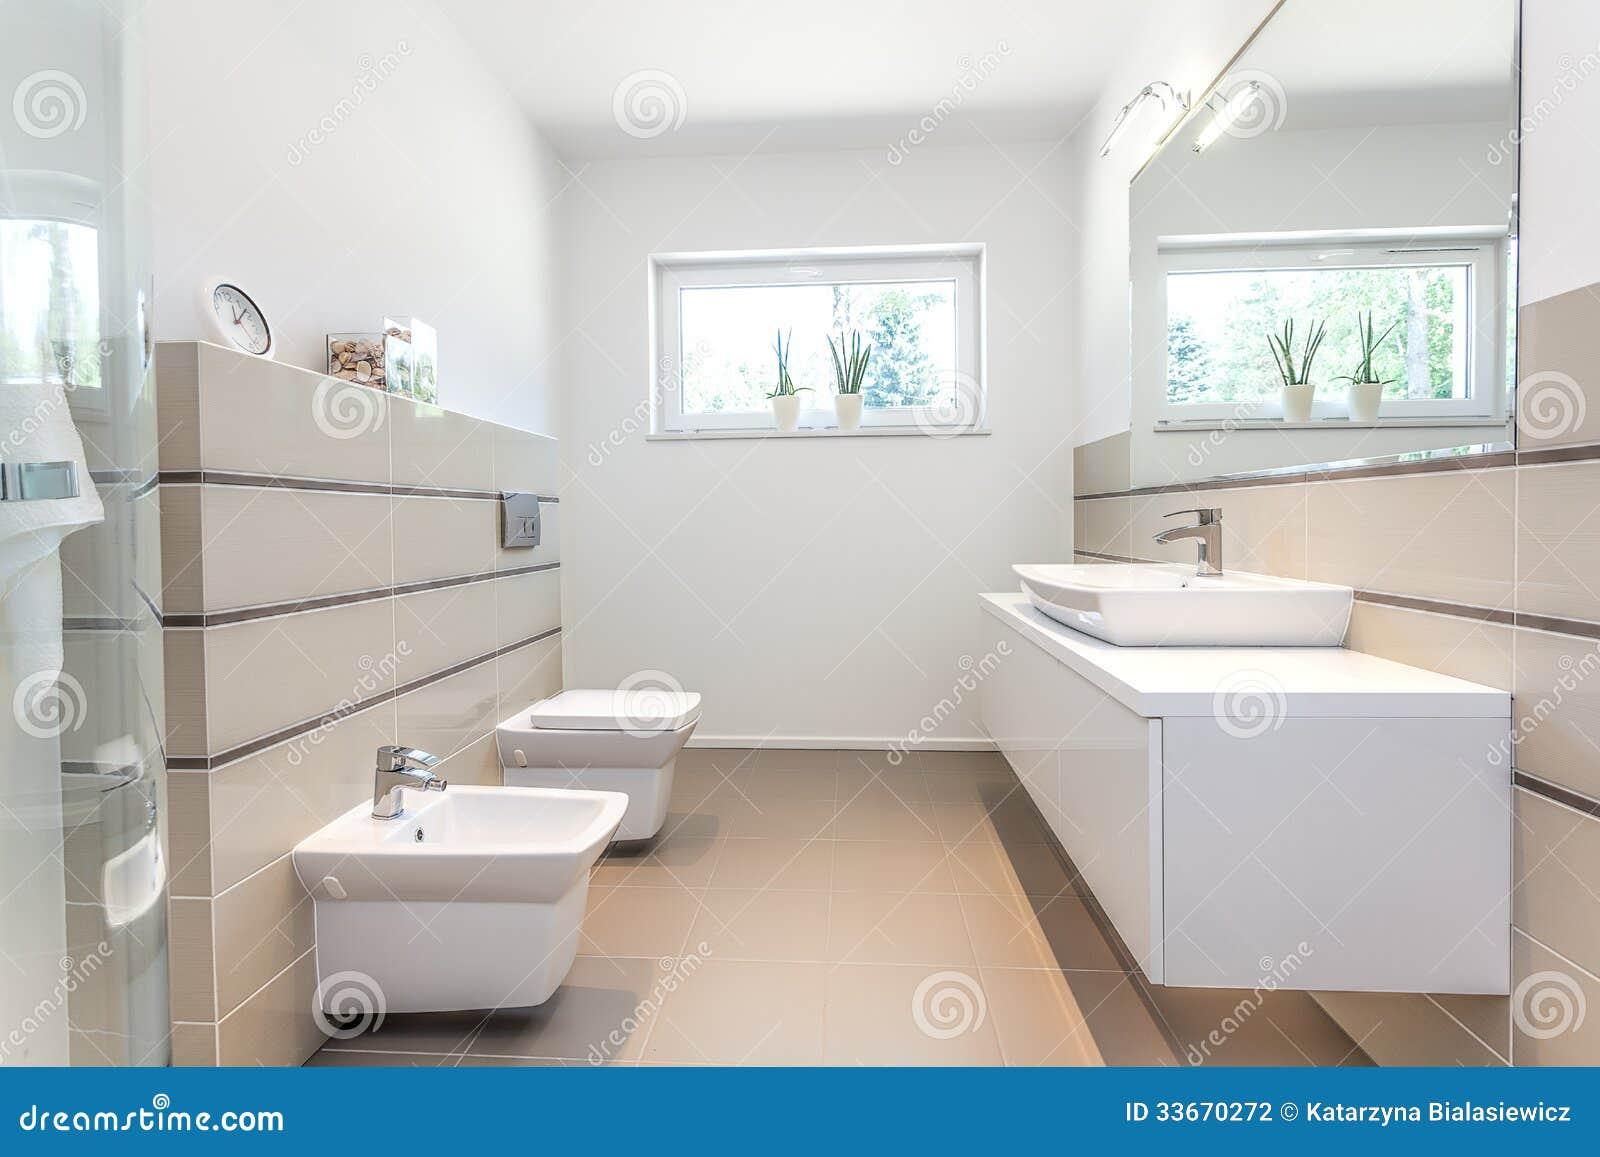 Heldere ruimte witte badkamers stock fotografie afbeelding 33670272 - Badkamers ...